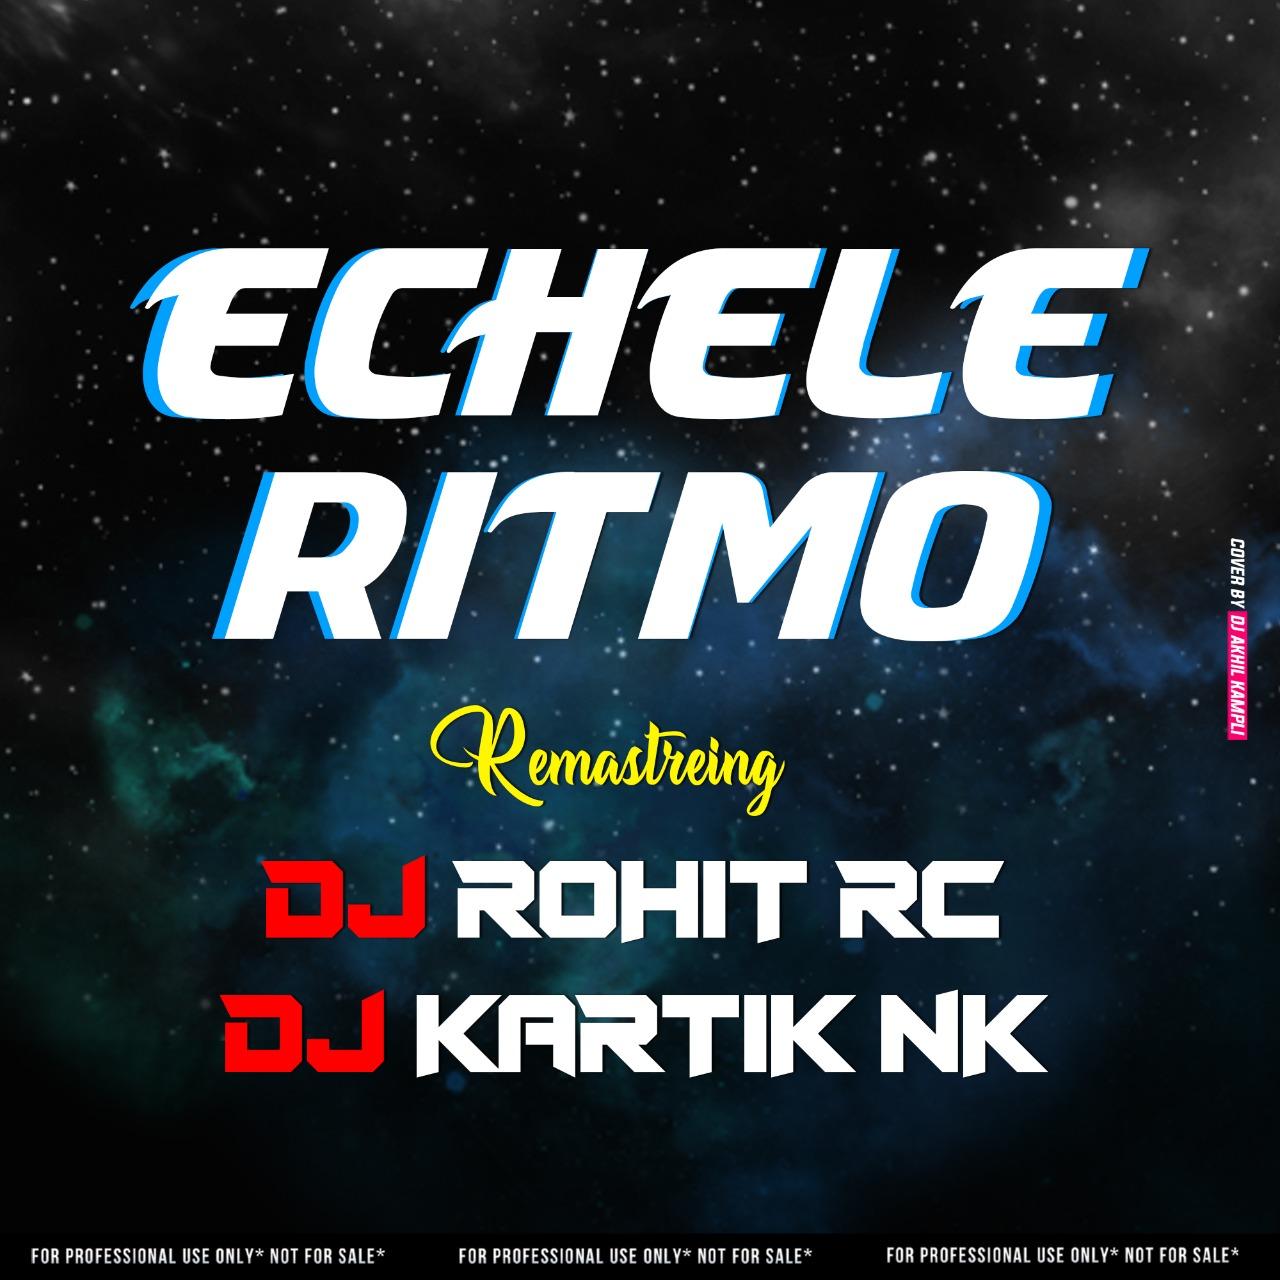 ECHELE RITMO REMASTERING BY DJ ROHIT RC  DJ KARTIK NK